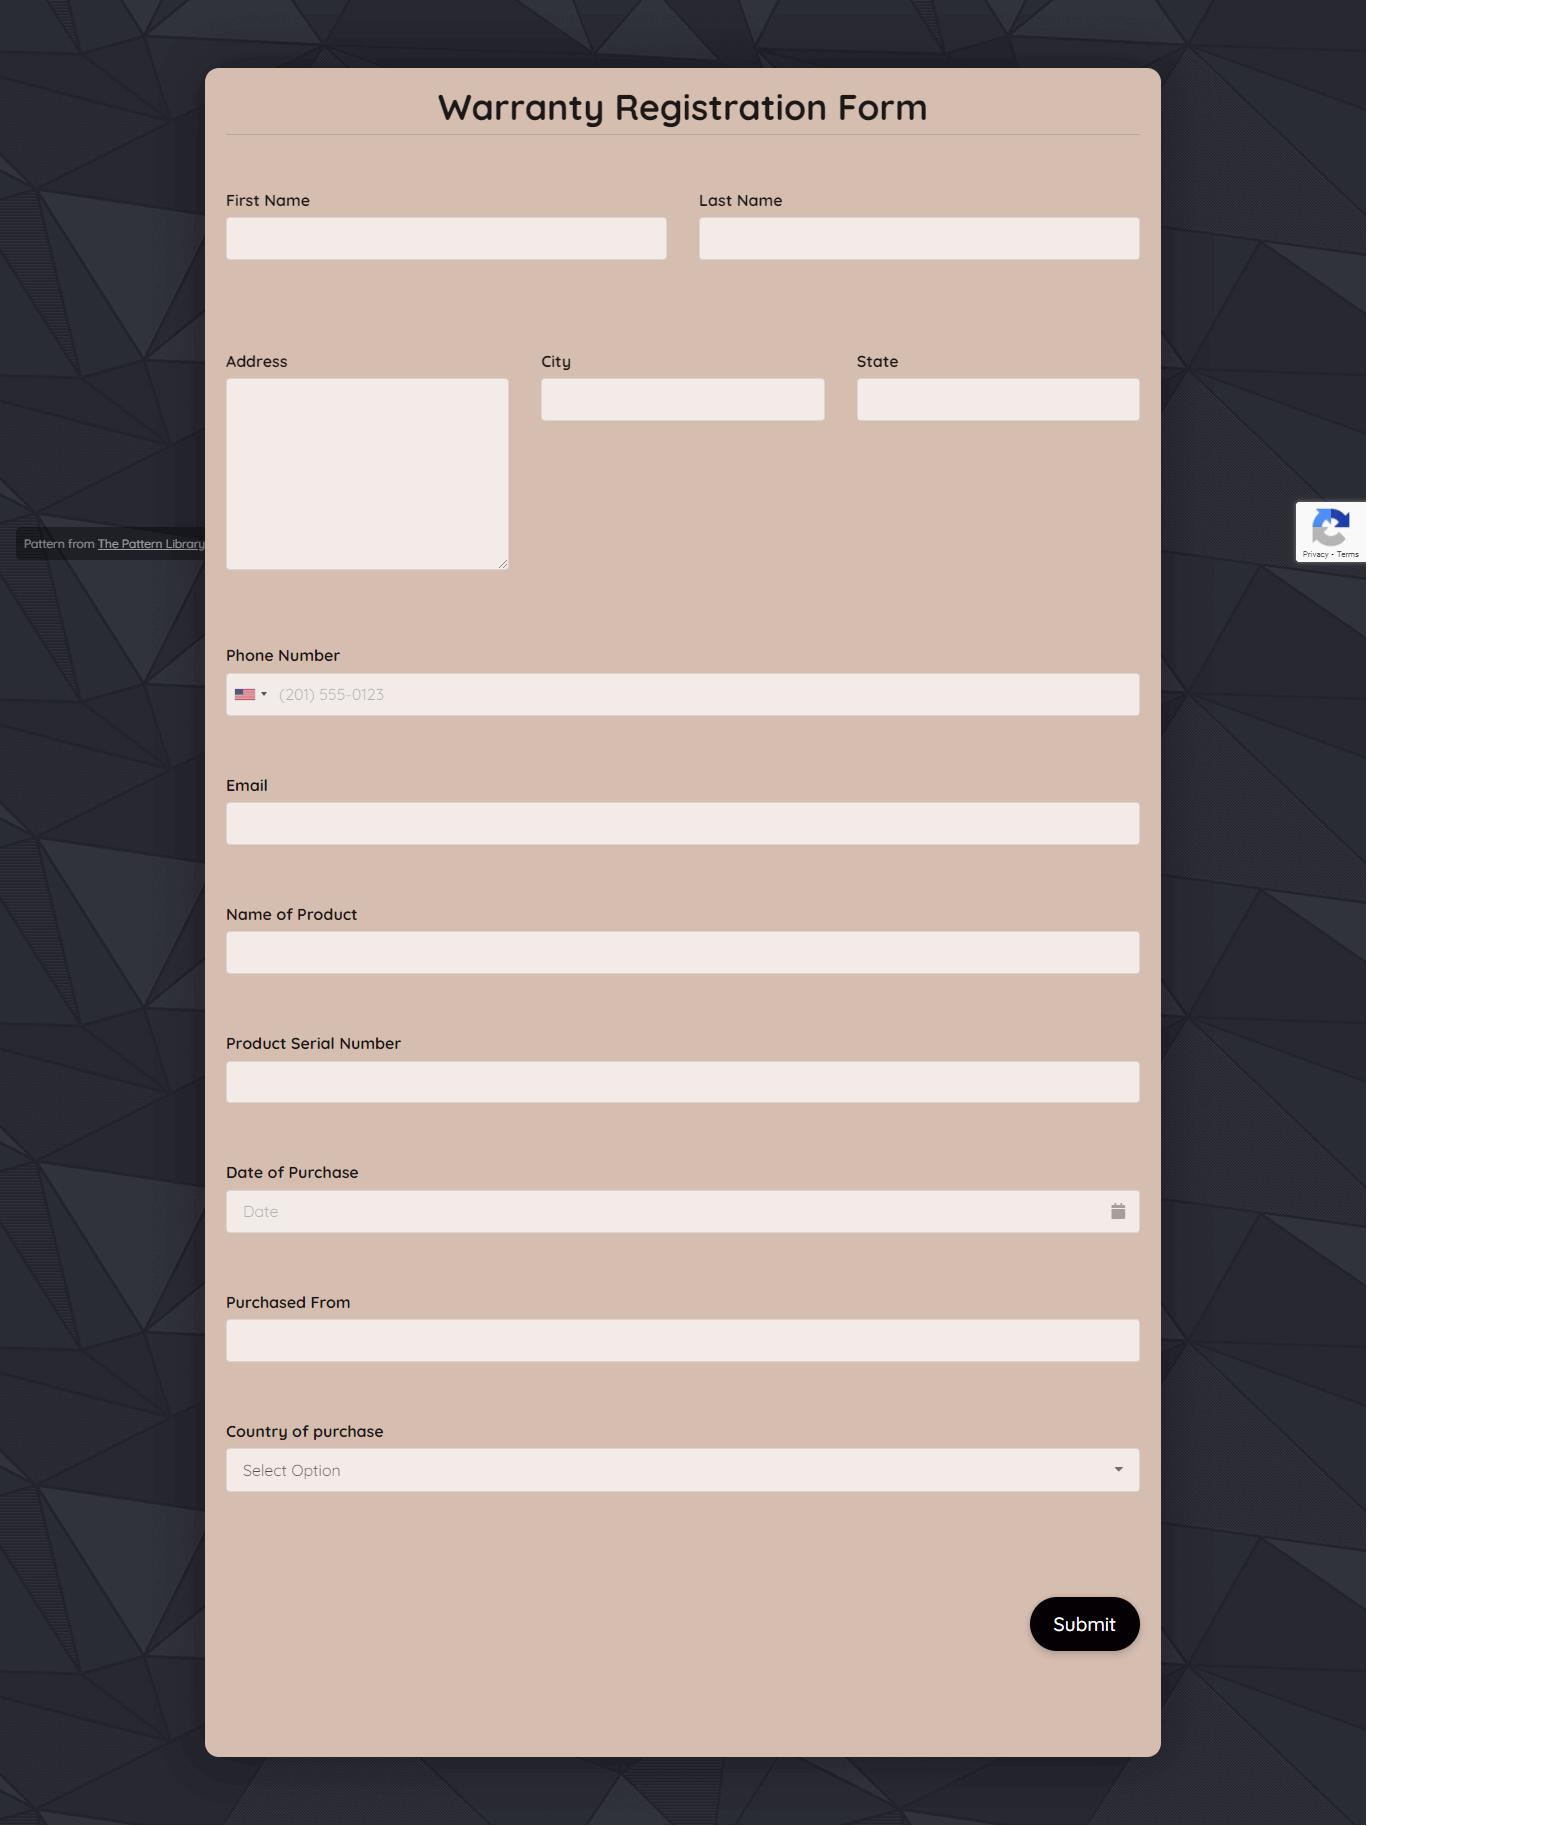 Warranty Registration Form Template template